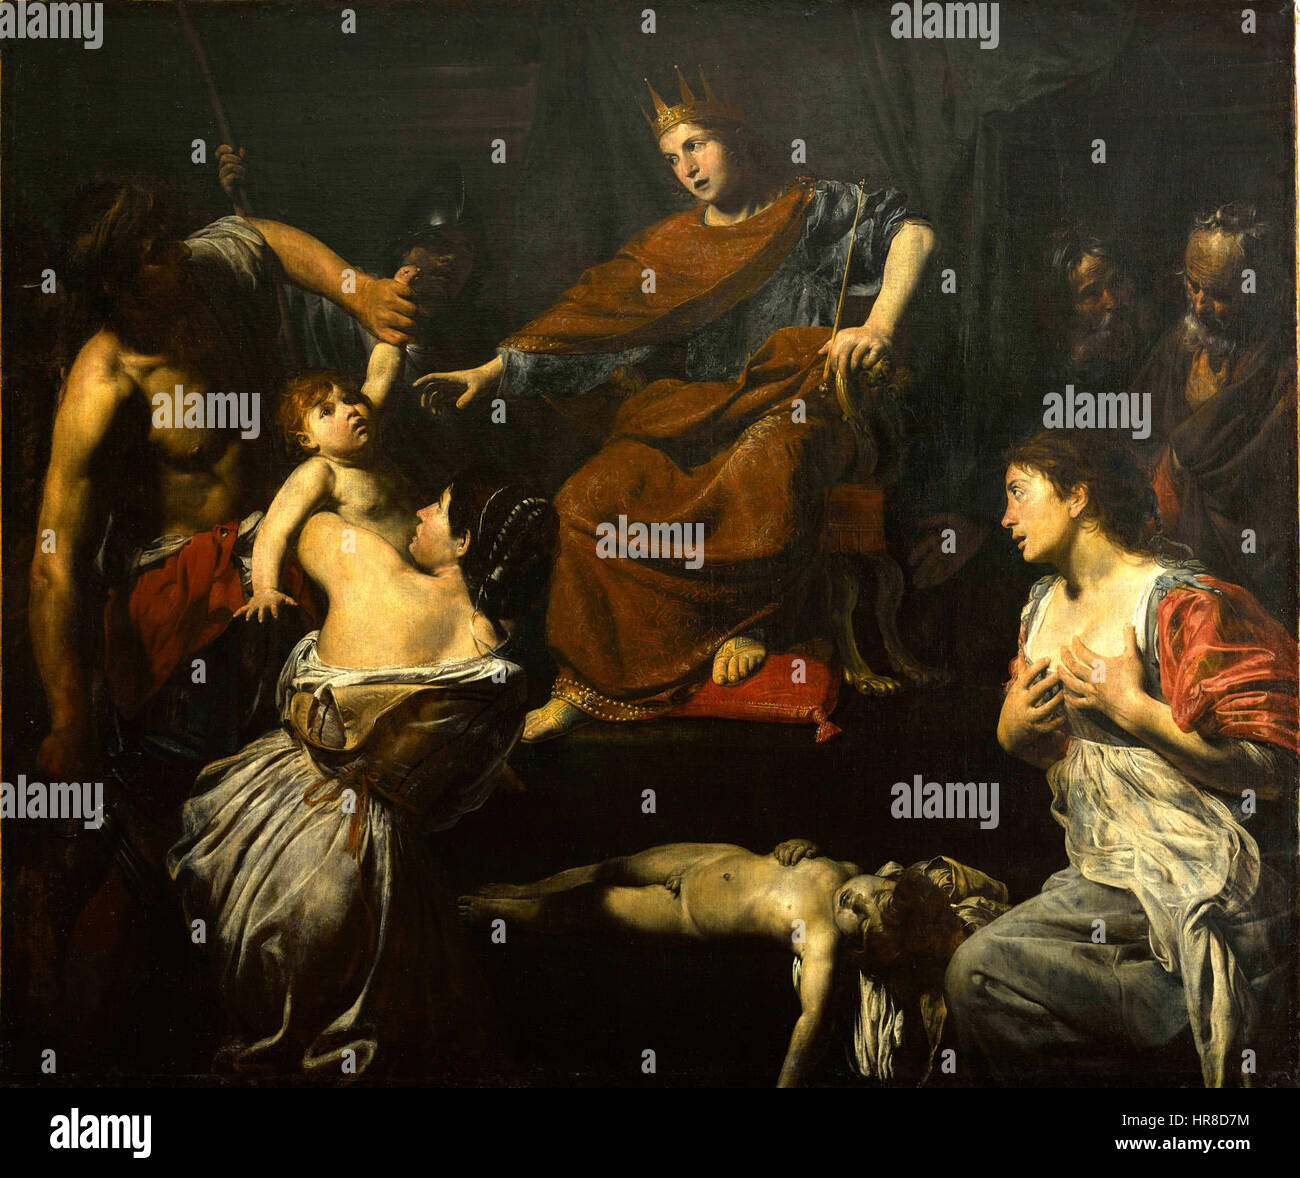 Valentin de Boulogne, Judgment of Solomon 02 - Stock Image